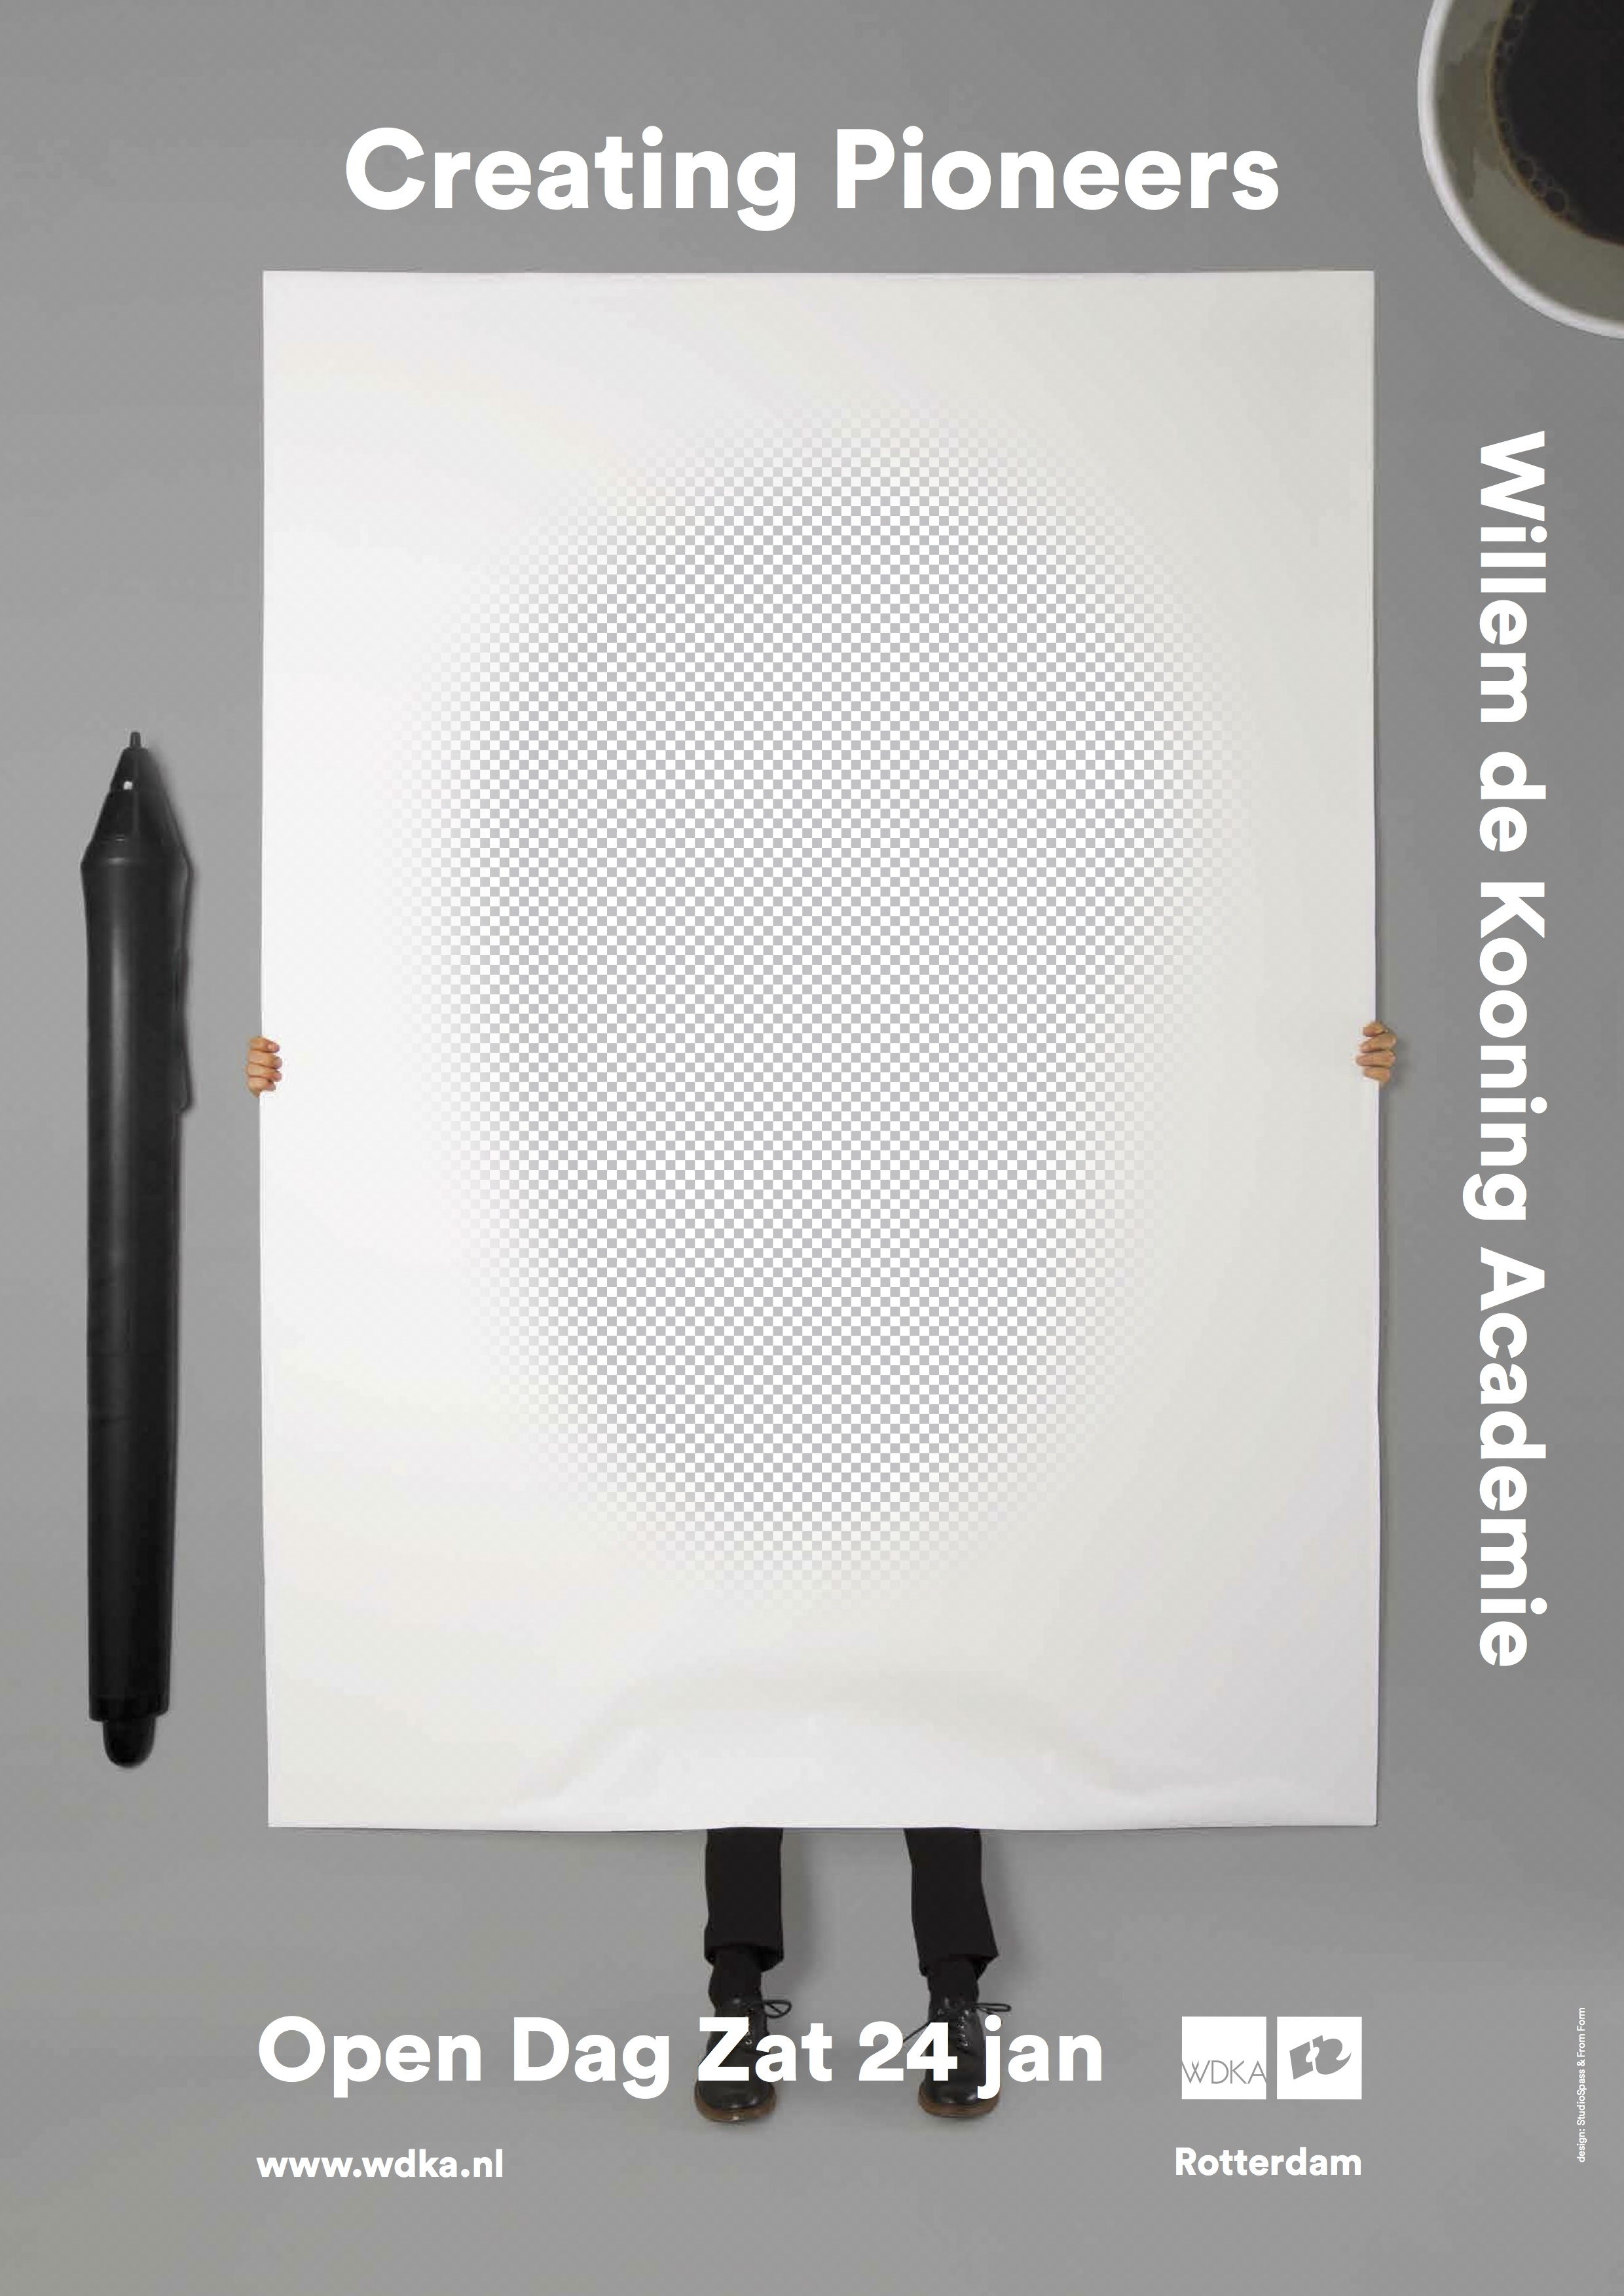 WDKA_Posters_1.jpg